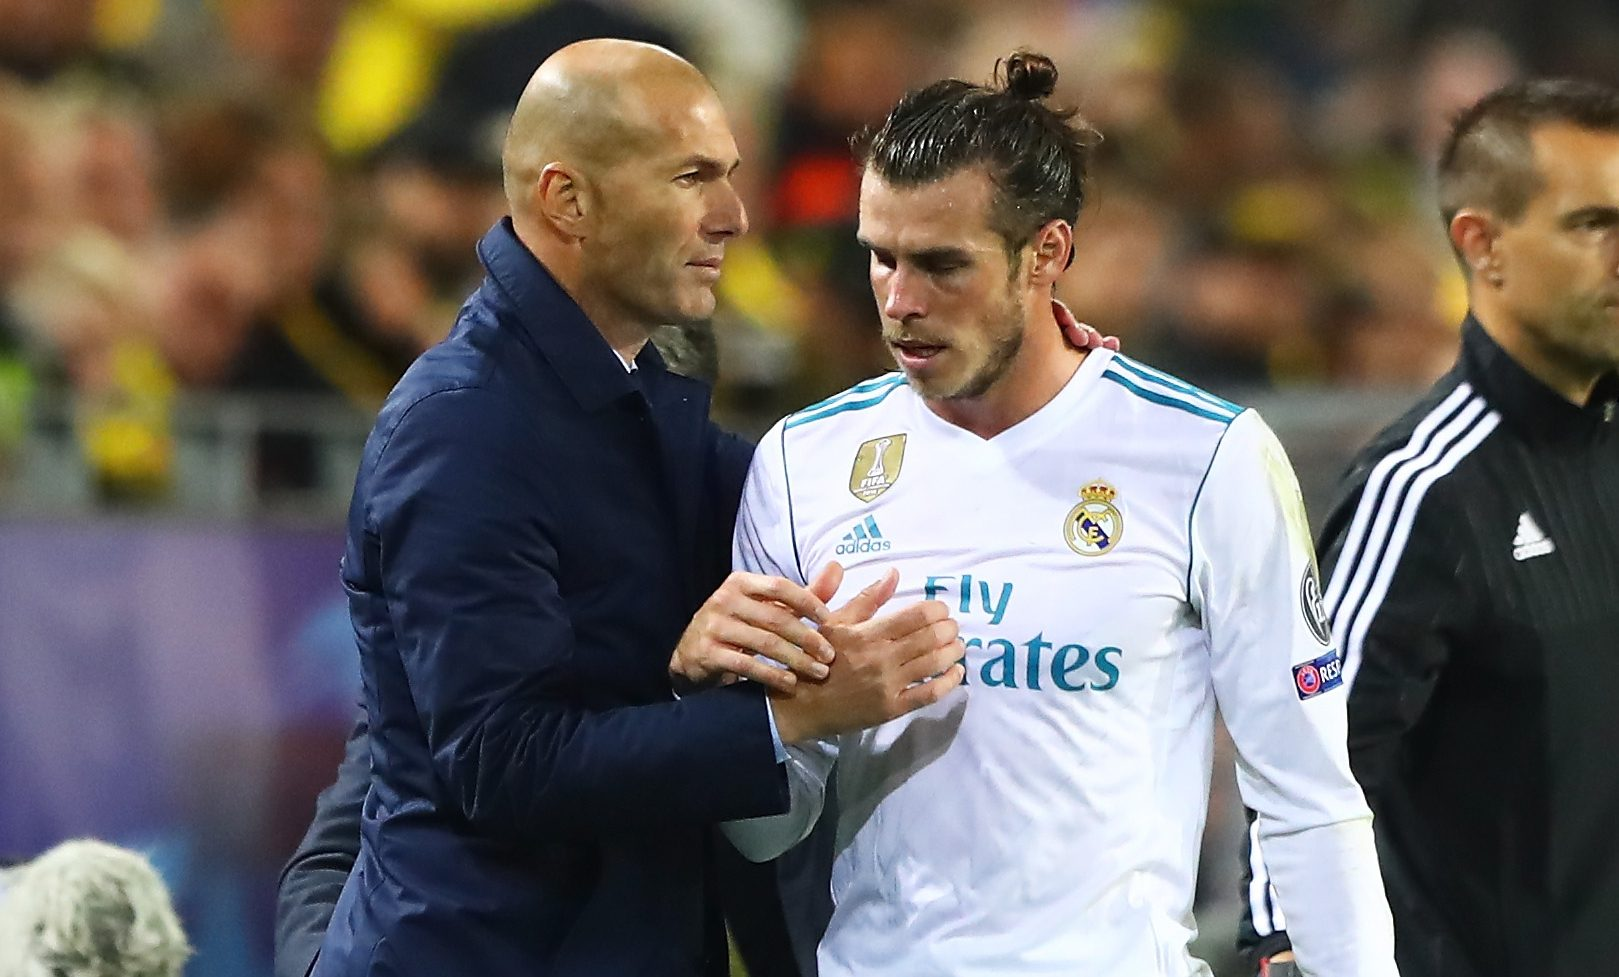 Gareth Bale the only Real Madrid player to snub Zinedine Zidane on social media